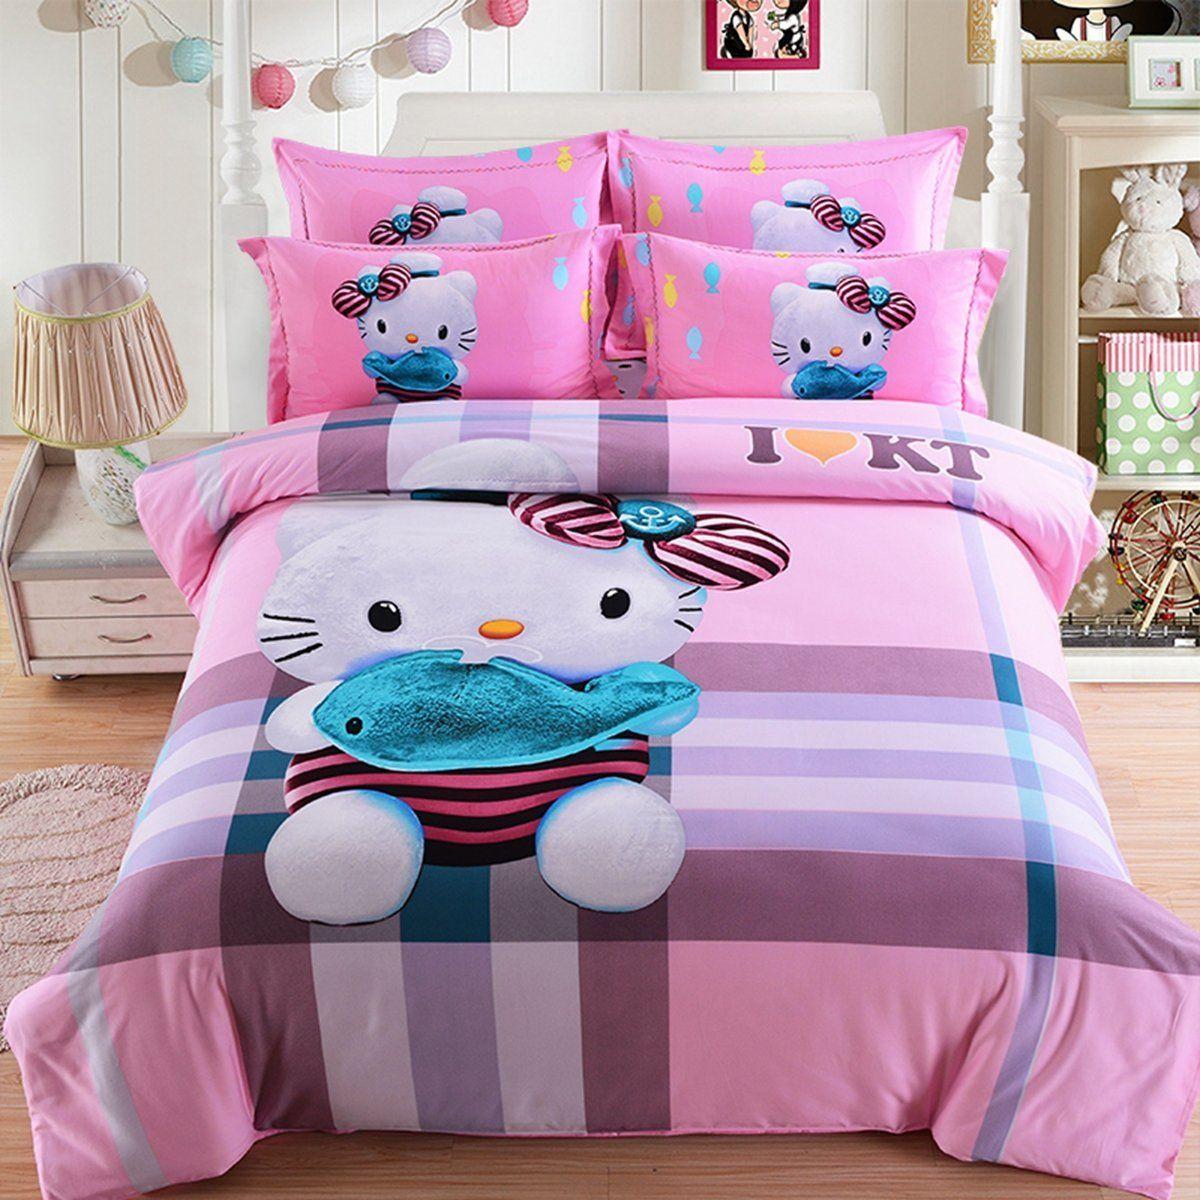 CASA 100 Cotton Brushed Kids bedding Hello Kitty Duvet